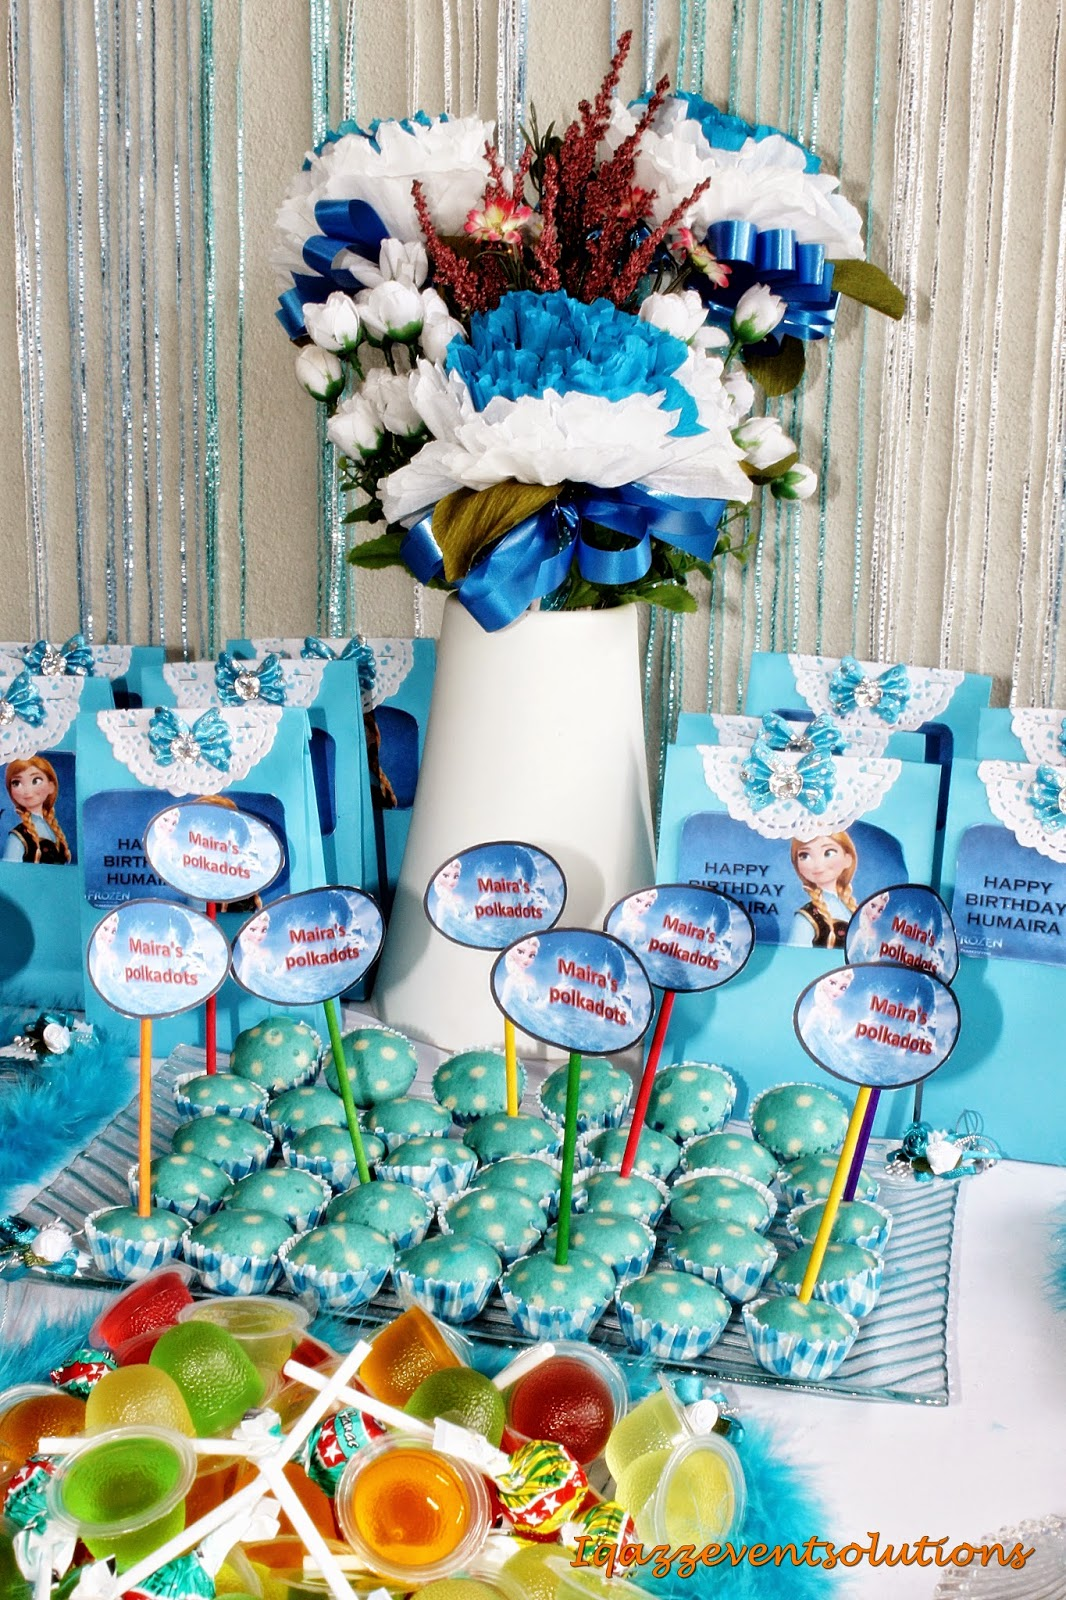 Iqazz Event Solutions Candy Buffet Birthday Frozen Mairas